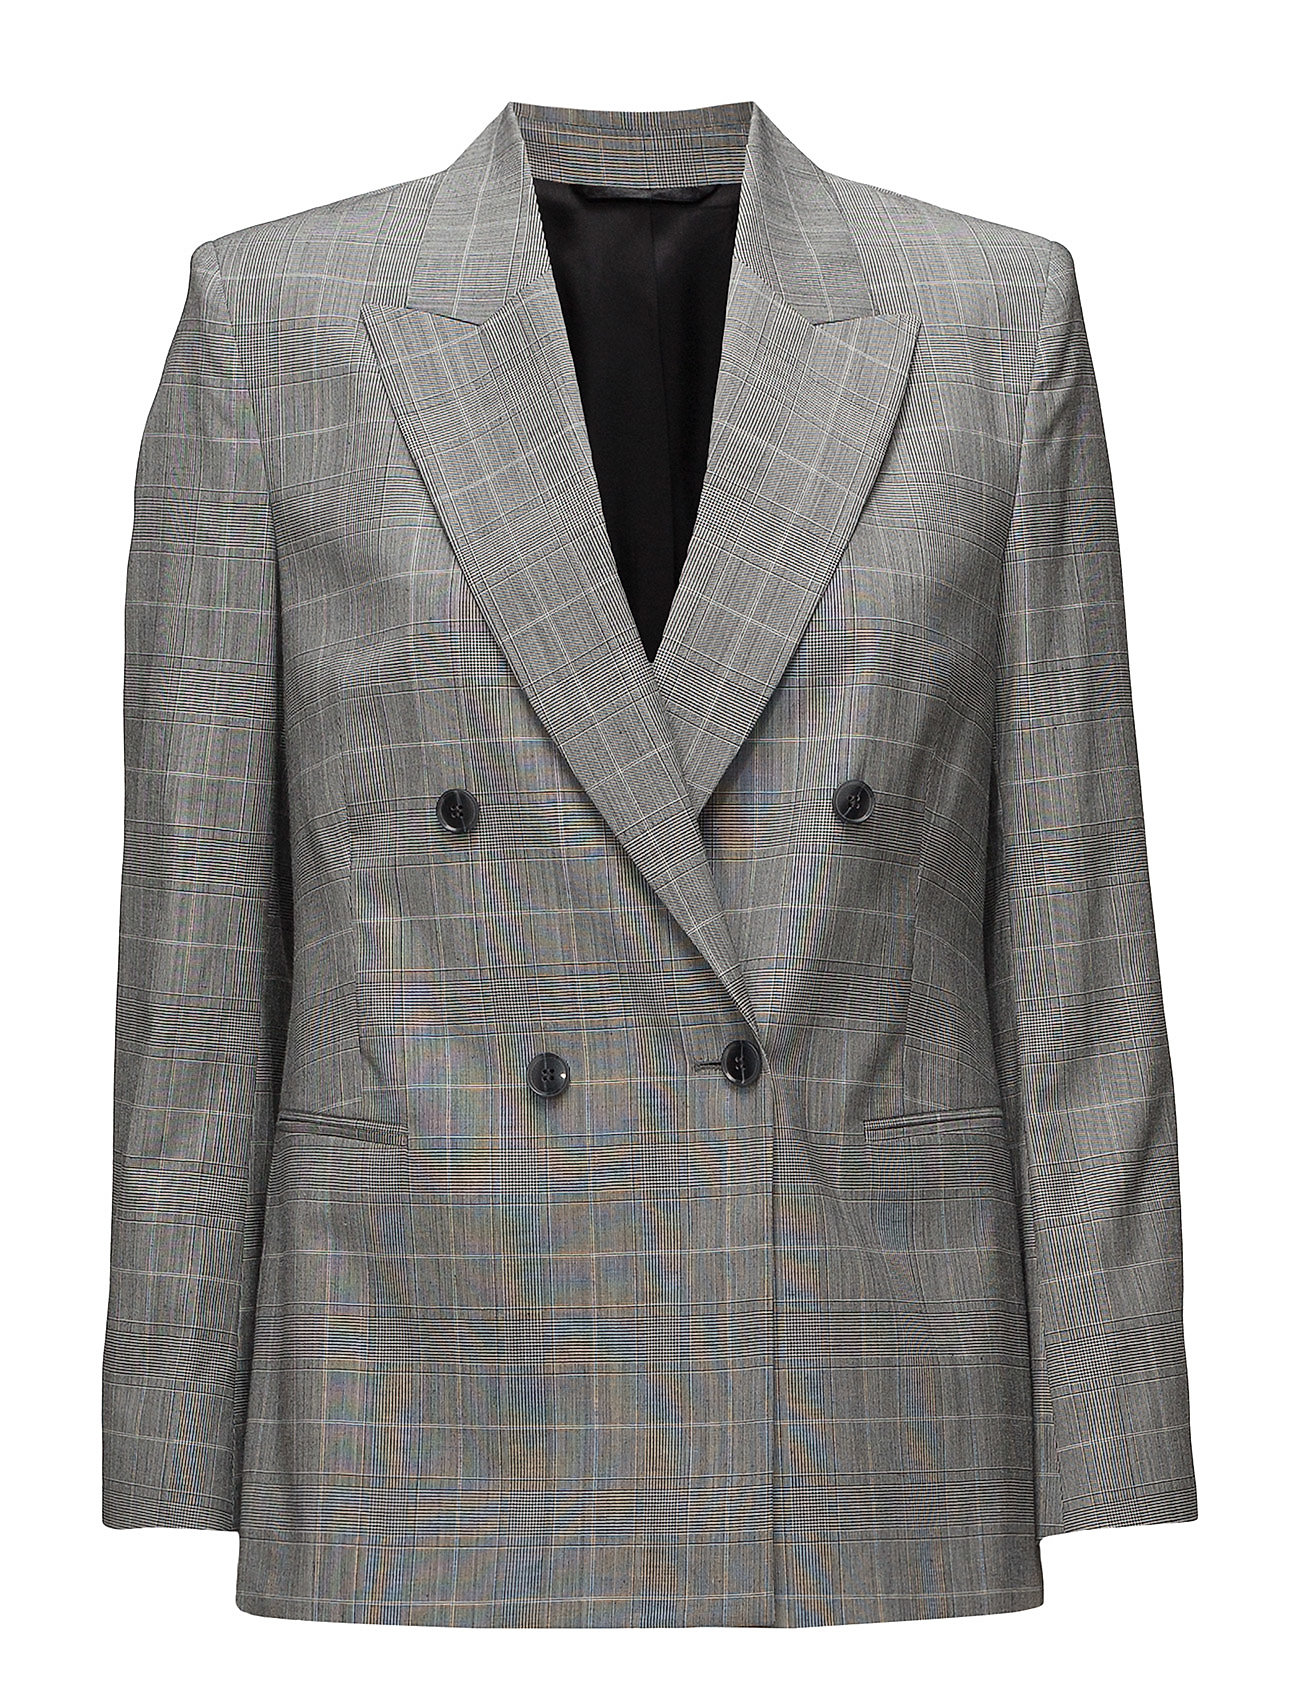 Filippa K Katie Check Suit Jacket - CHECKS